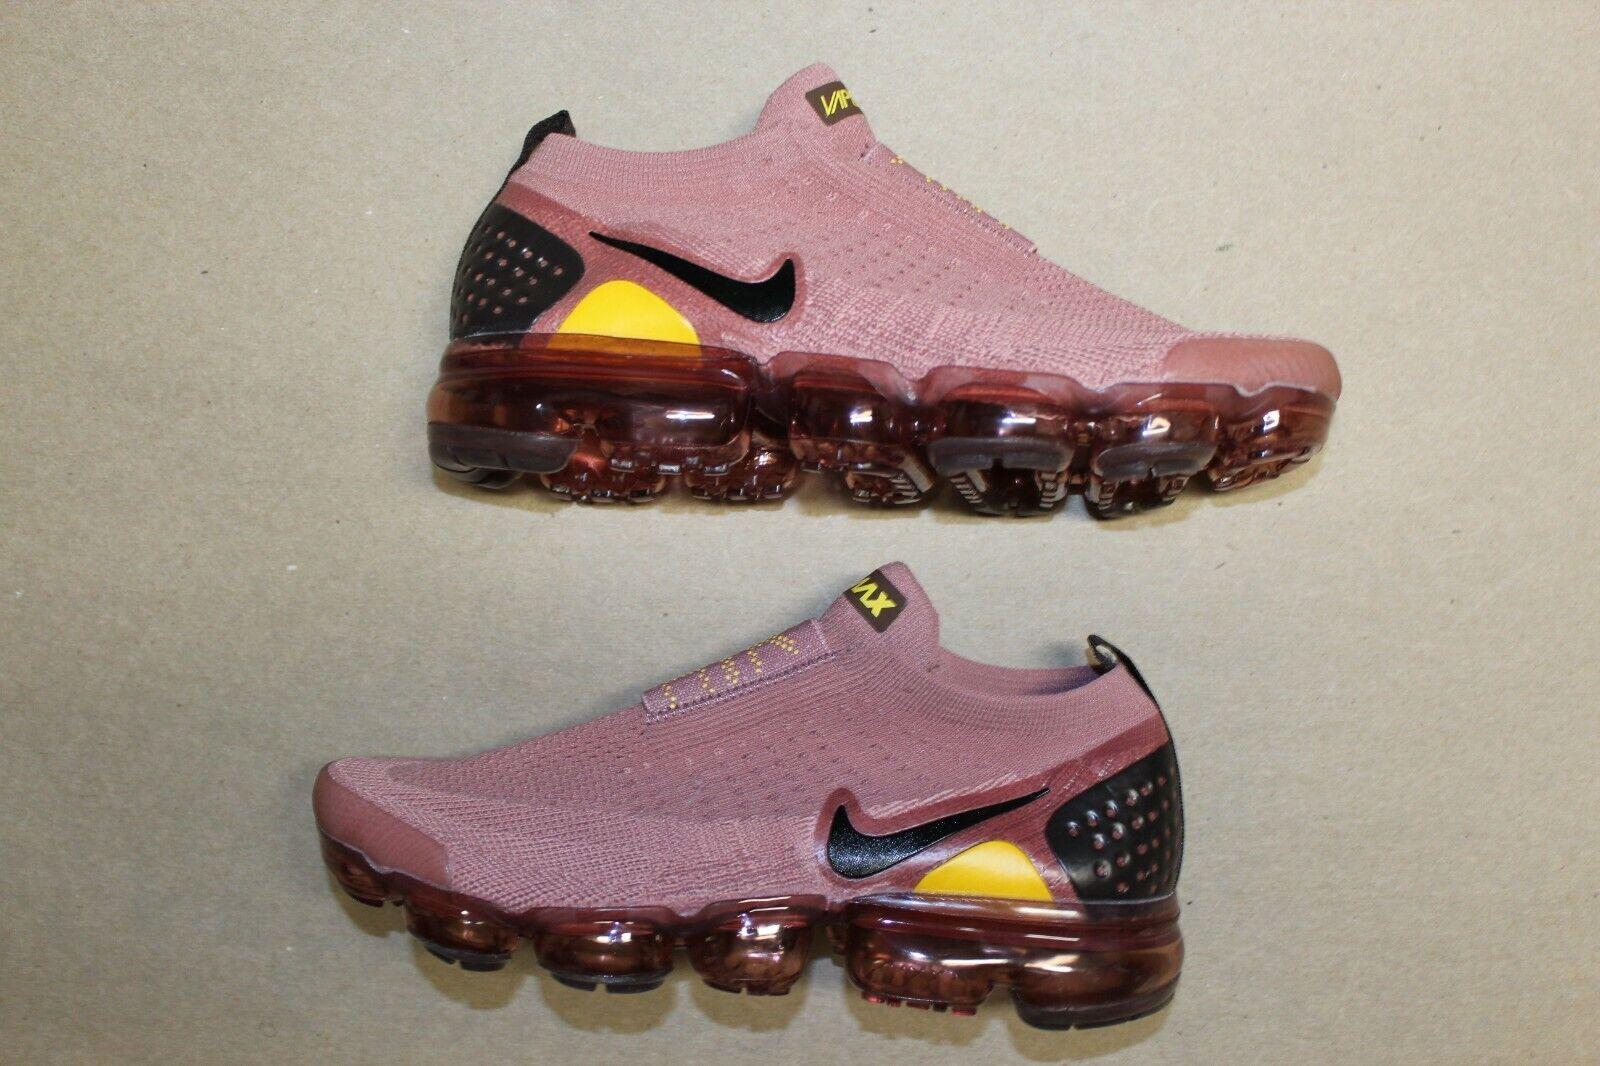 Women's Nike Air Vapormax Flyknit Moc 2 Laceless Size 8 Burgundy Yellow Brown